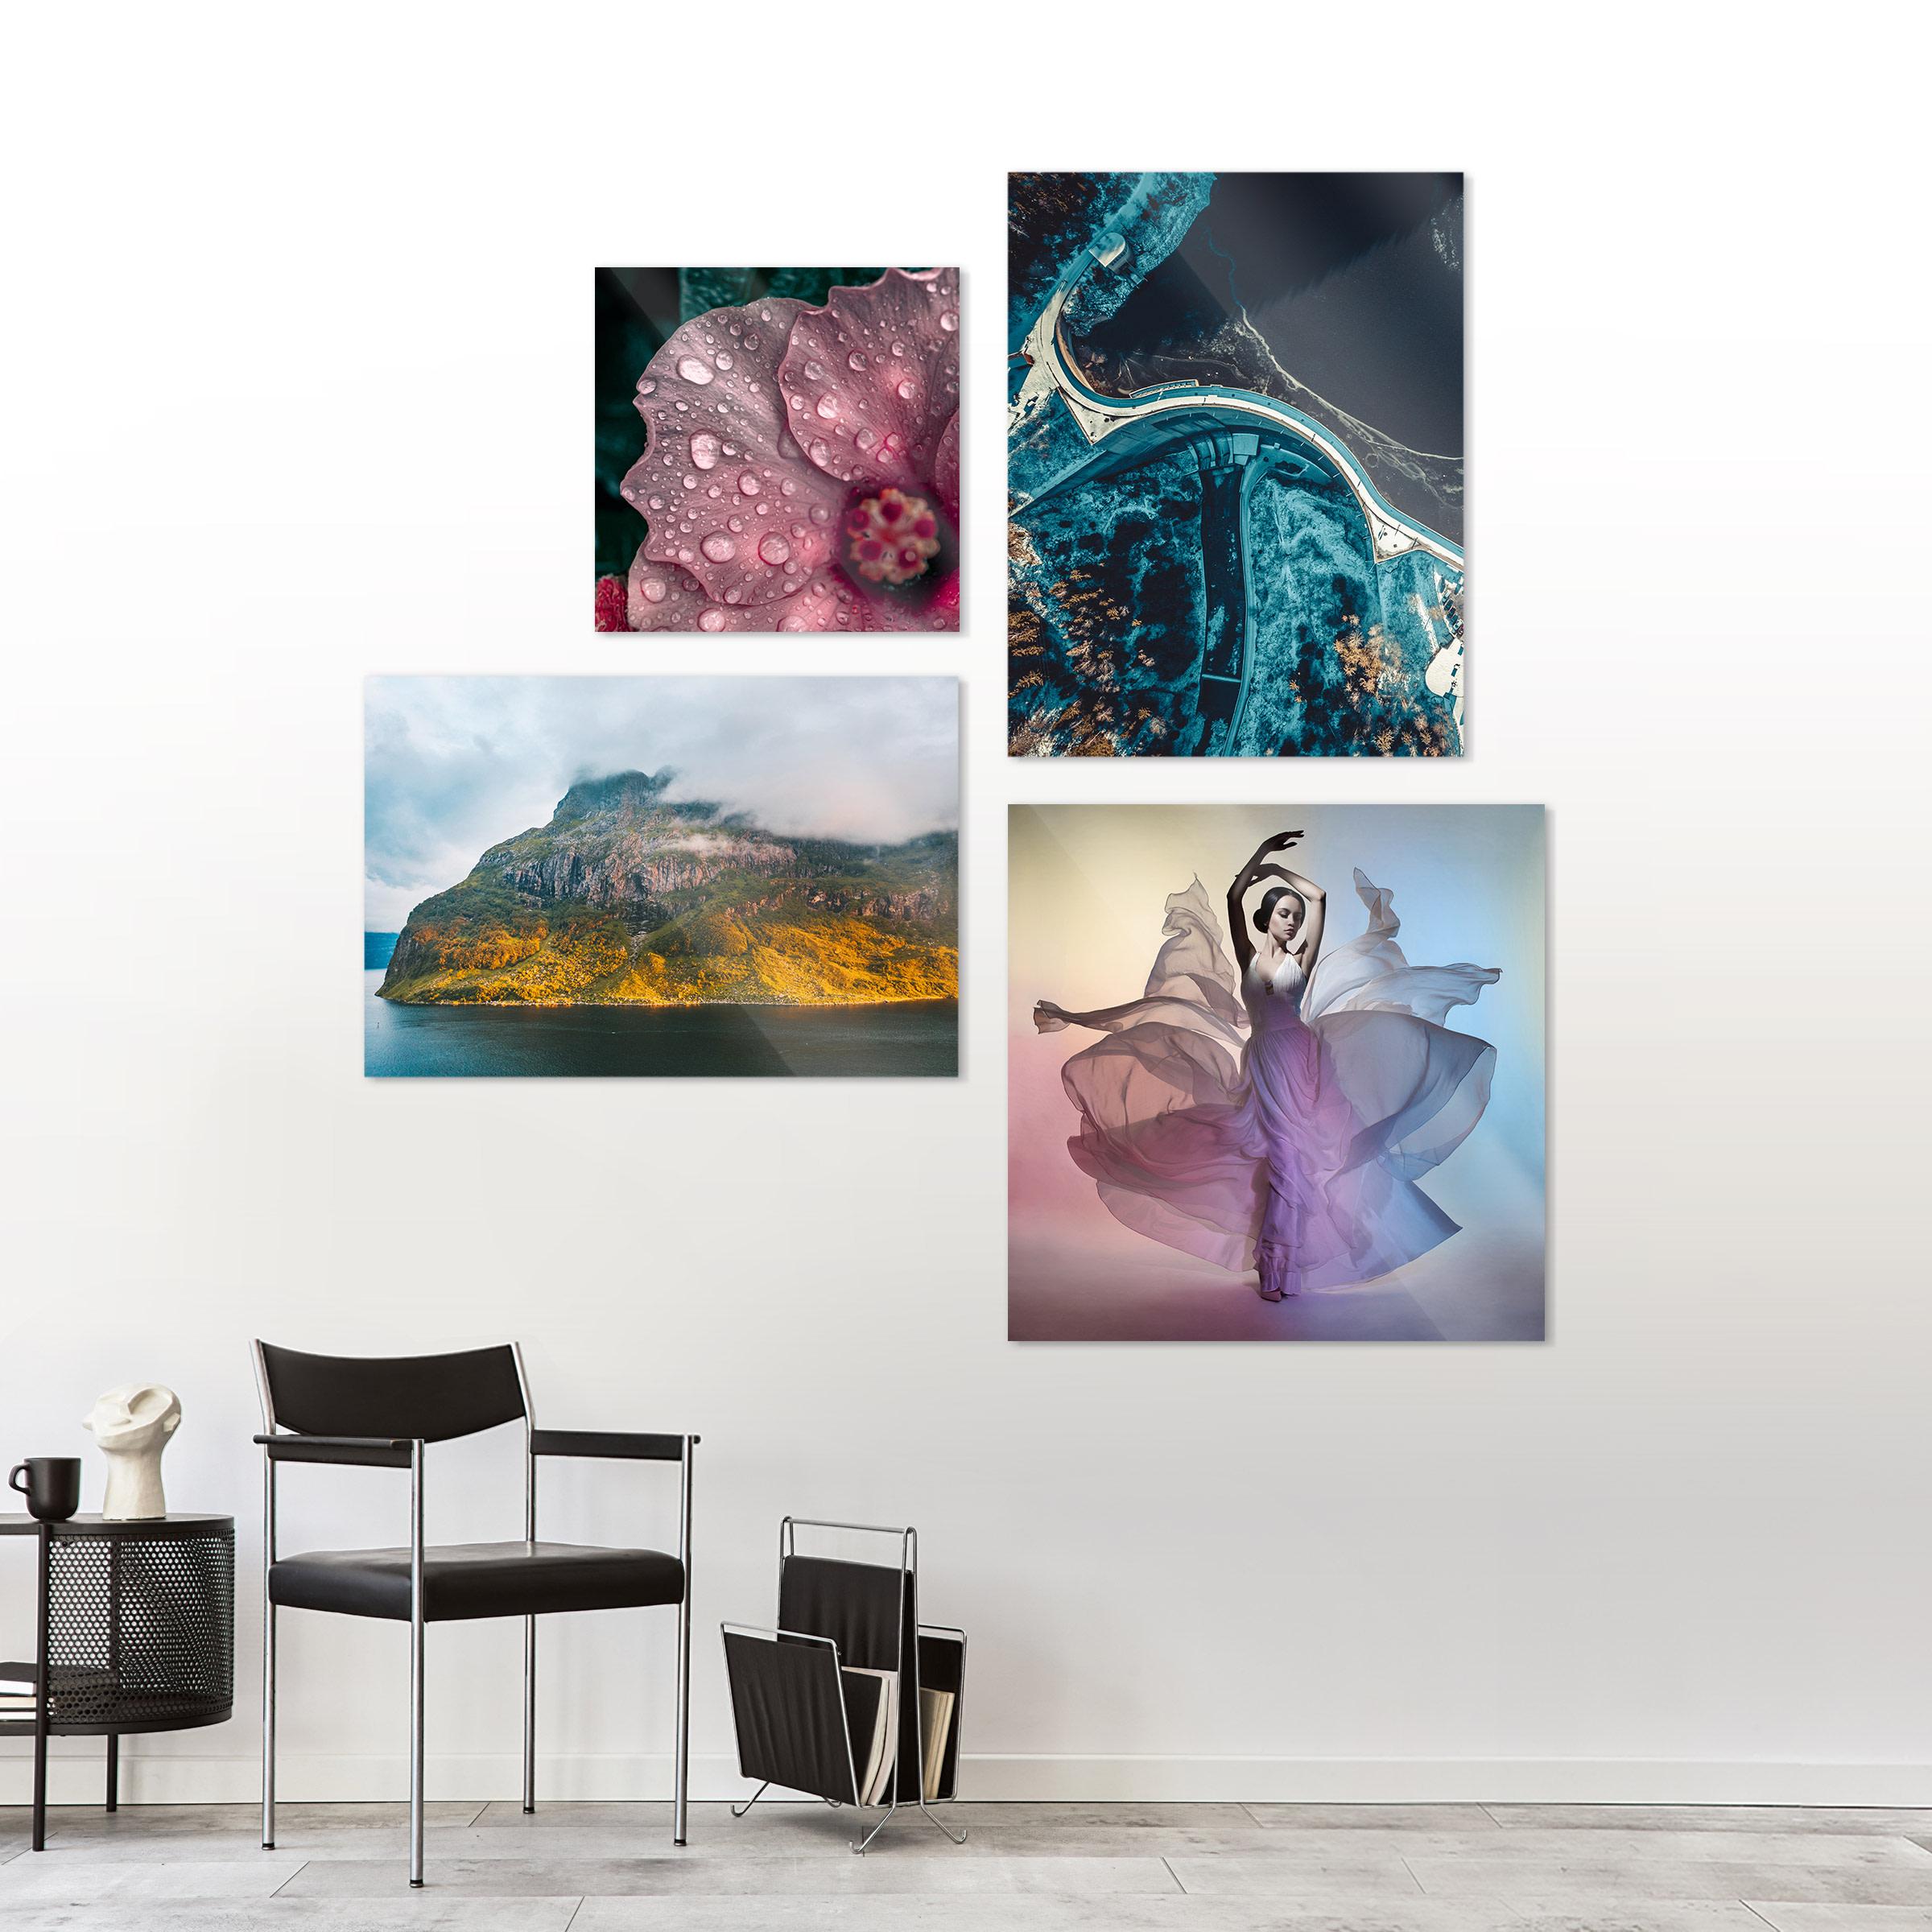 metallic-foto-hinter-acrylglas-ultra-hd-portrait-inspiration-1200x1200.jpg